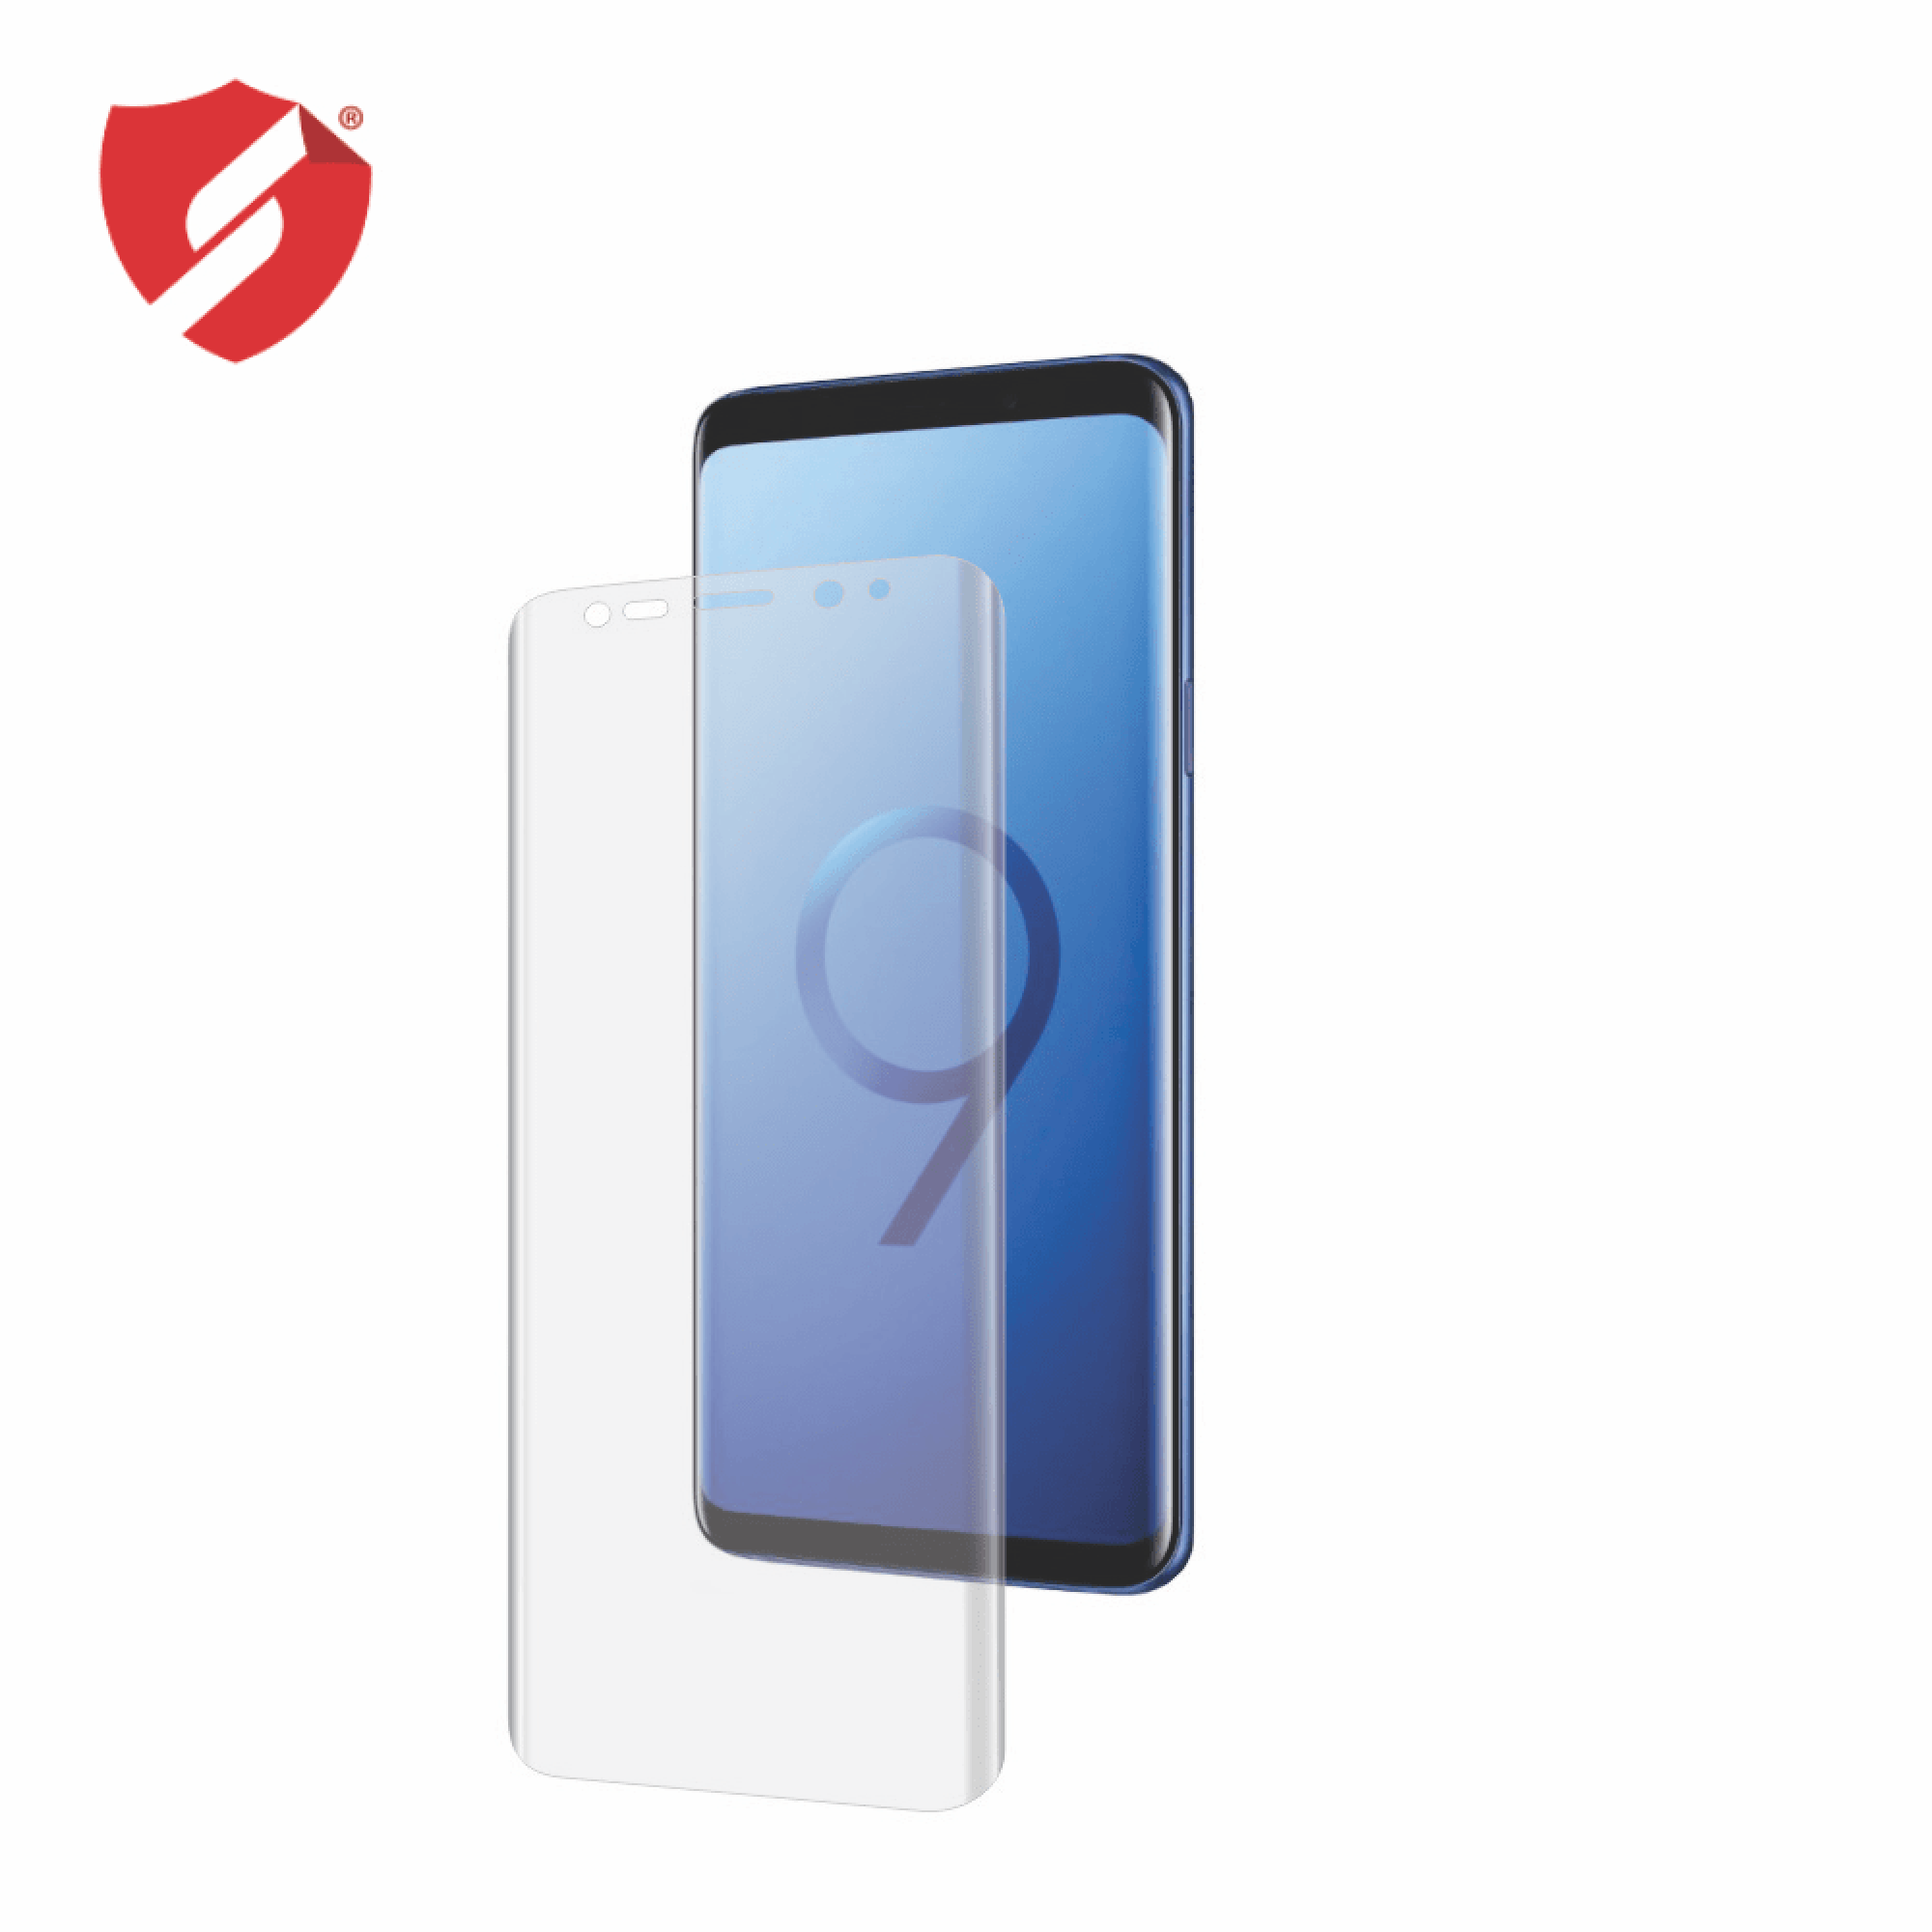 Folie de protectie Smart Protection Samsung Galaxy S9 Plus compatibila cu carcasa Spigen Rugged Armor - doar-display imagine